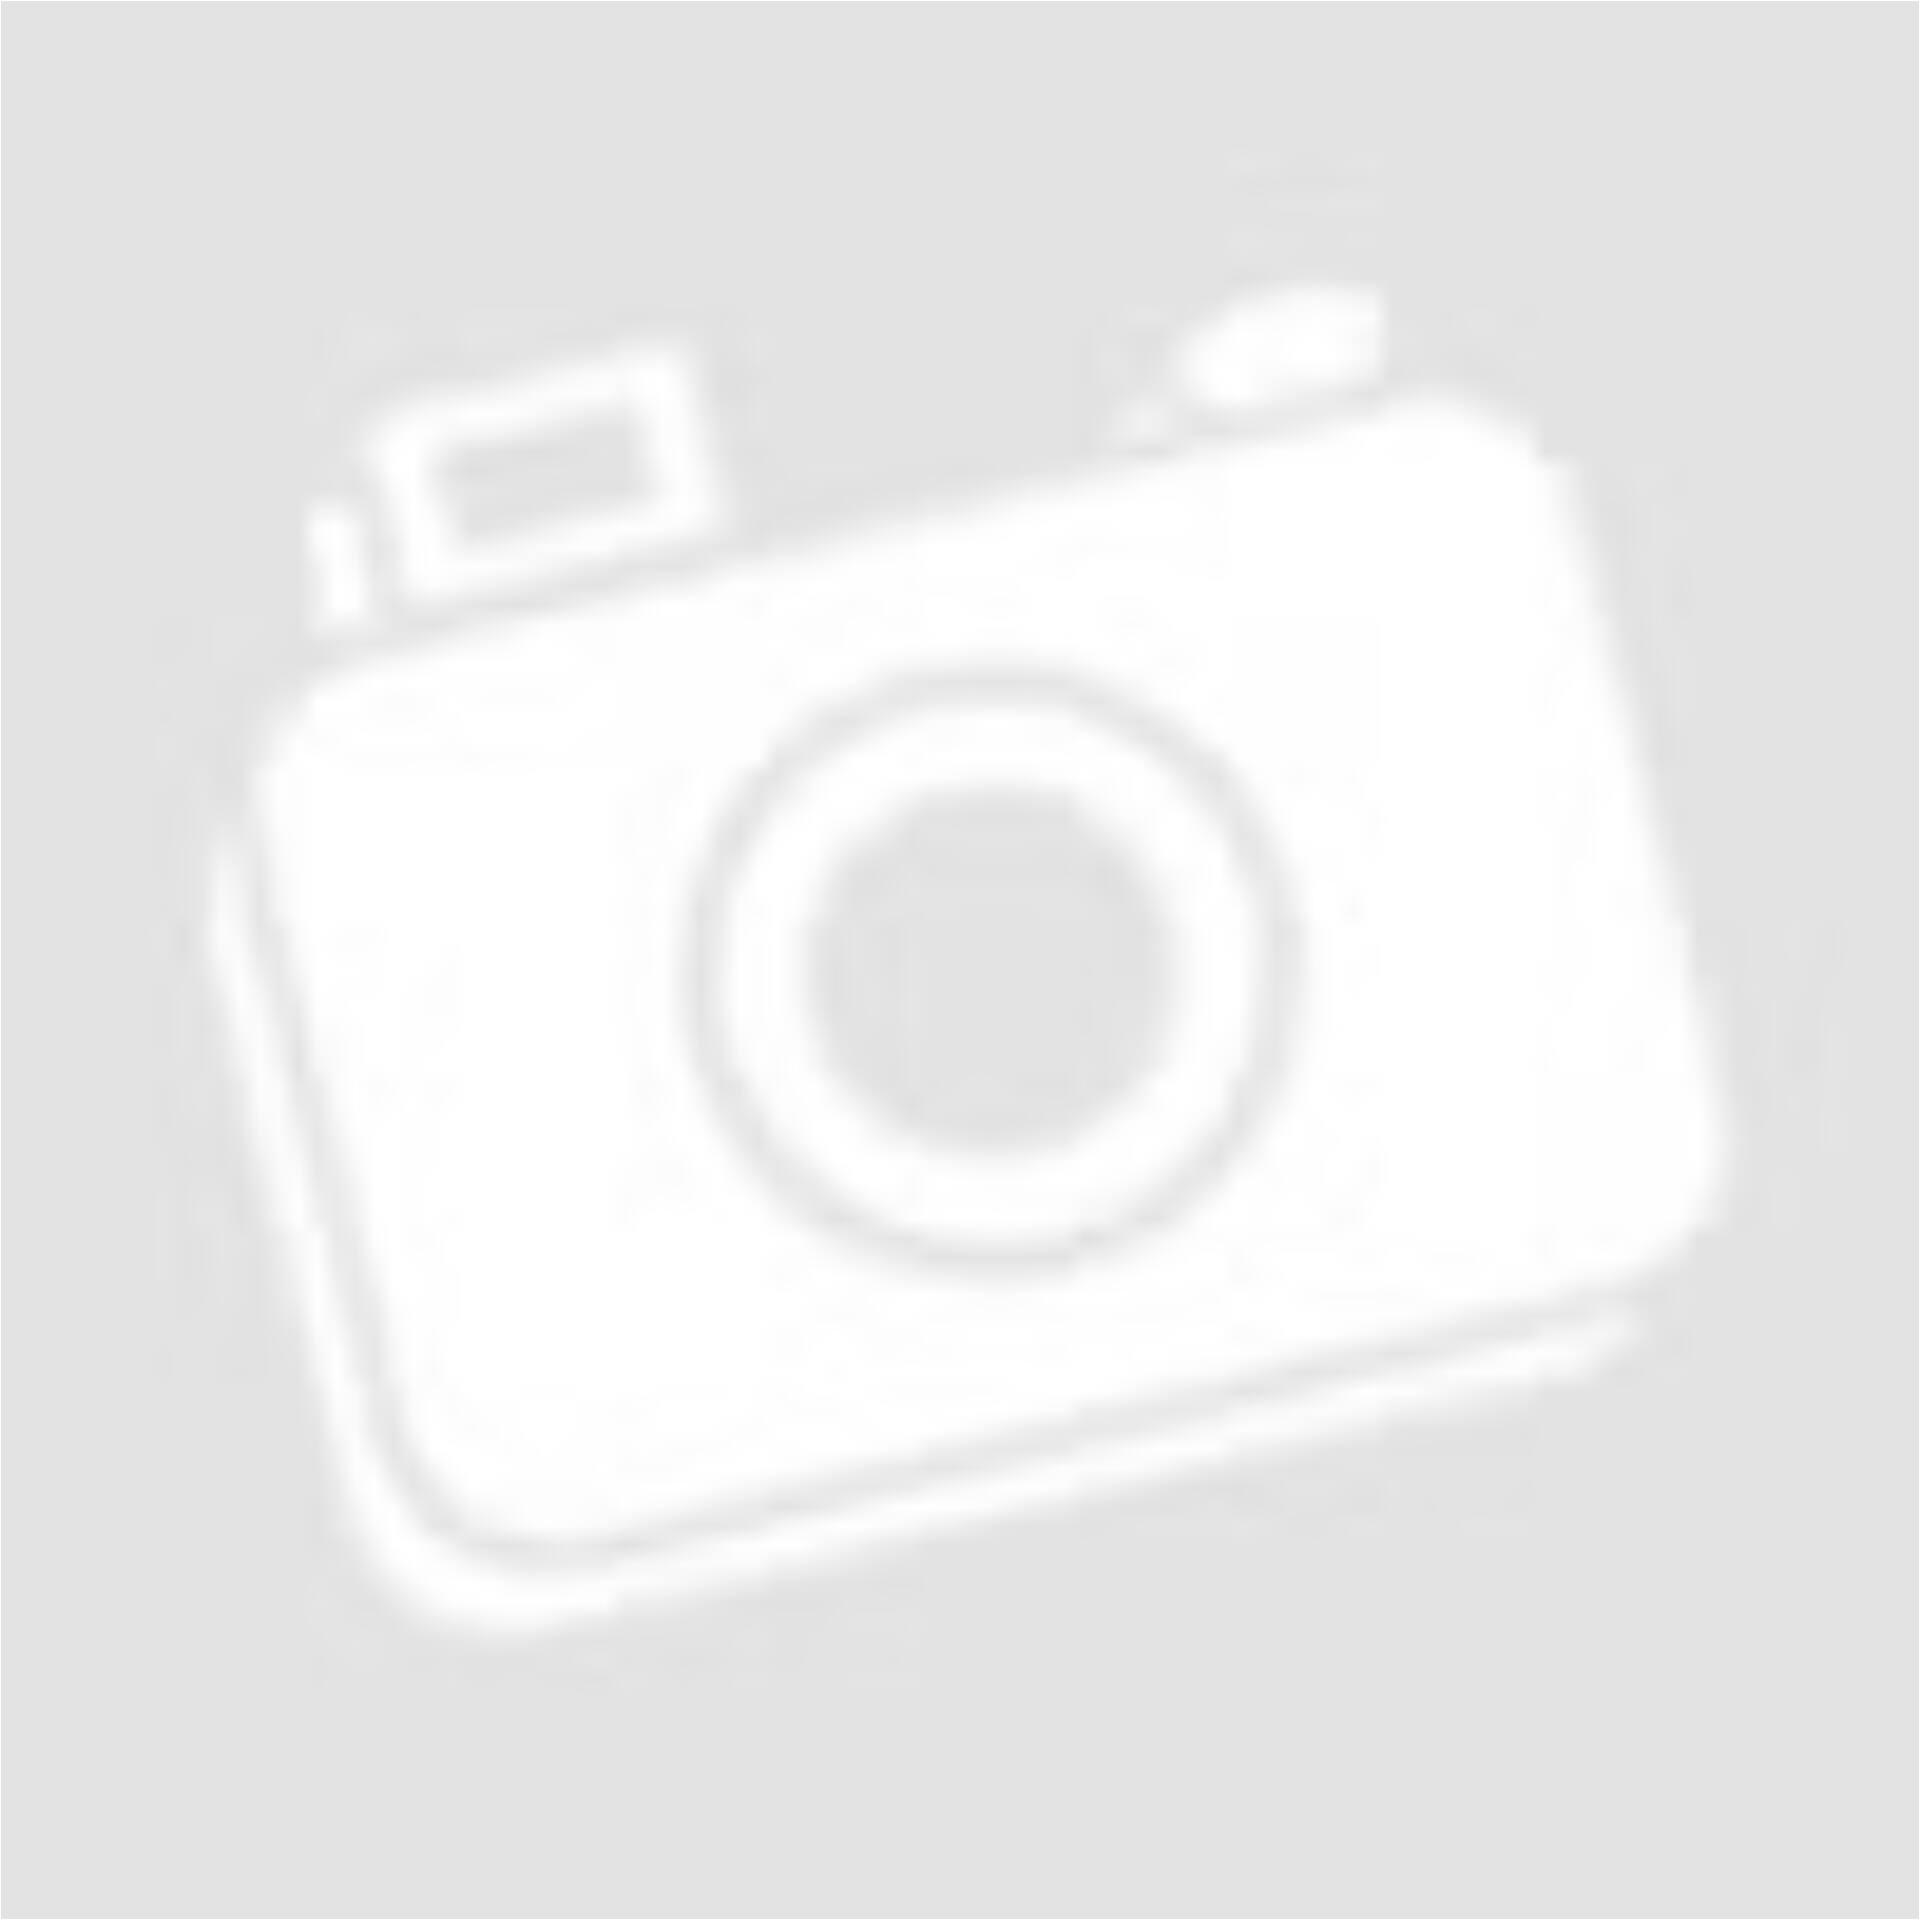 H M fekete pulóver (Méret  M) - Női pulóver 10d964bae5